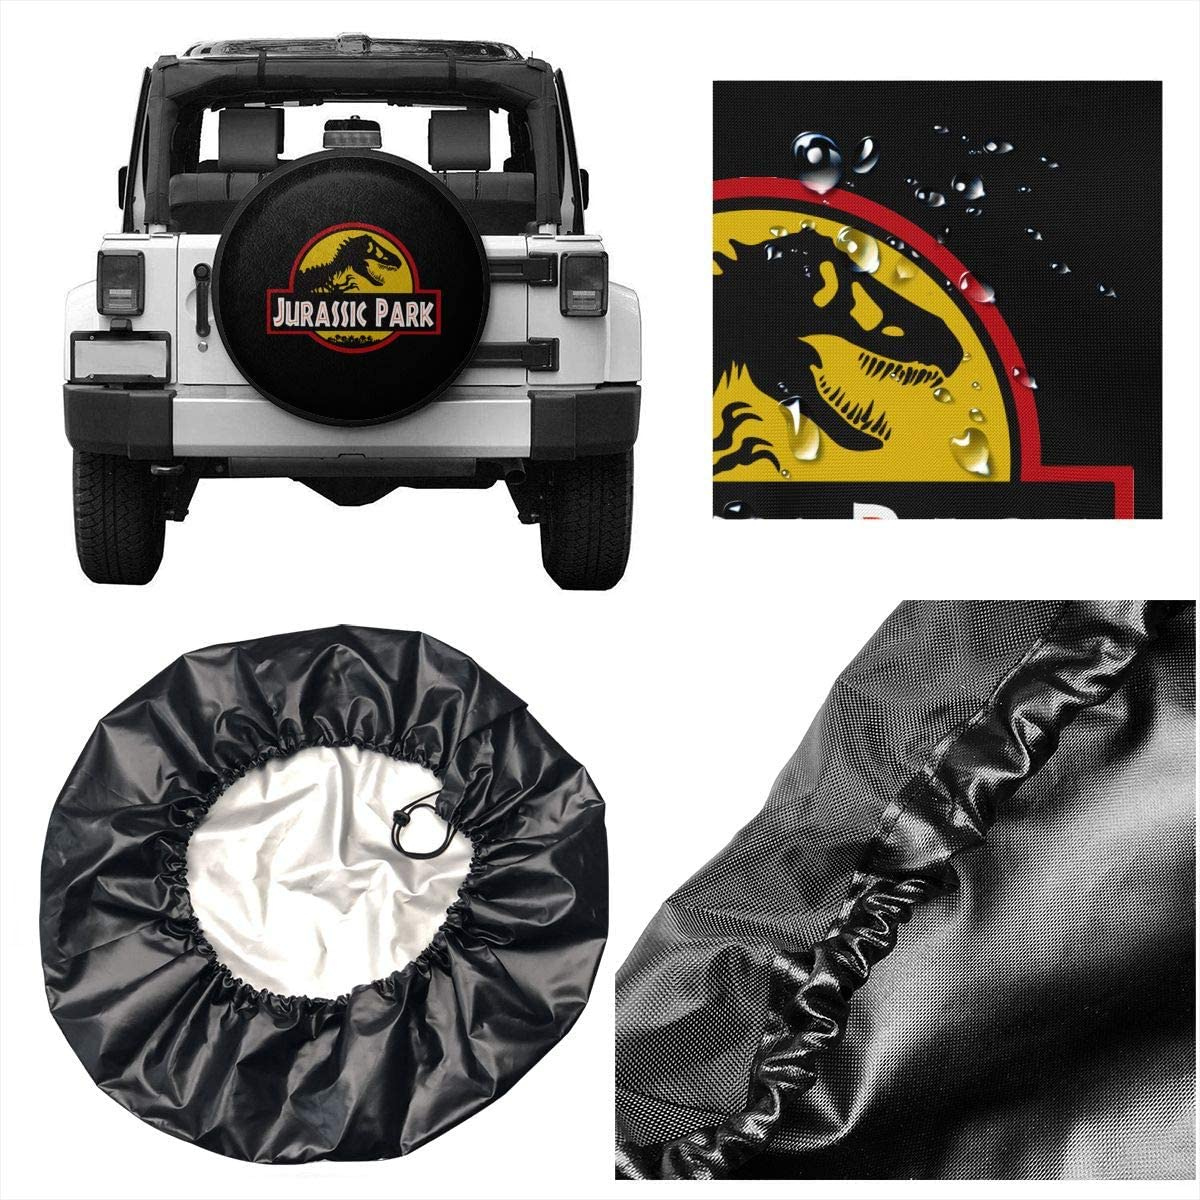 SWIO SOWJI Tire Cover Jurassic Park Spare Tire Cover